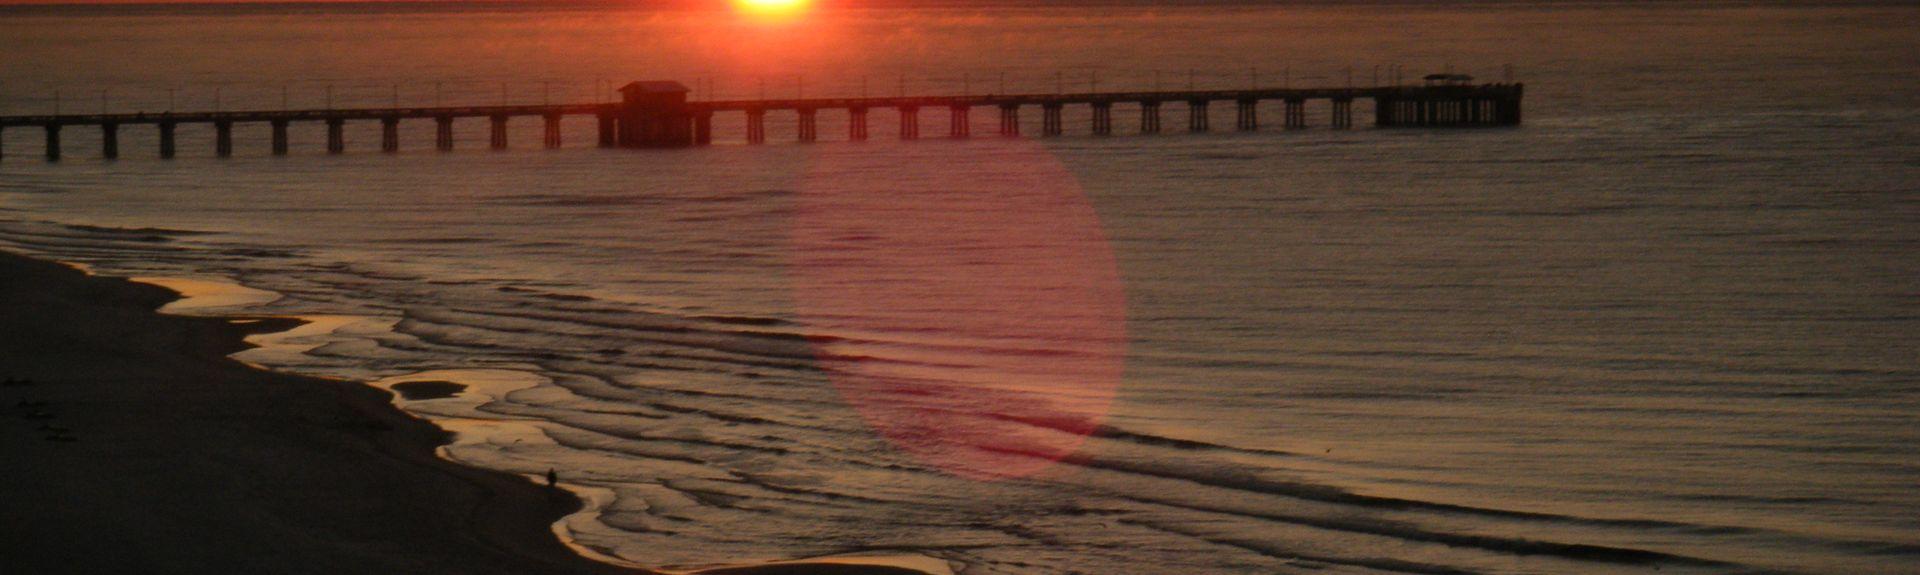 Island Sunrise, Gulf Shores, AL, USA